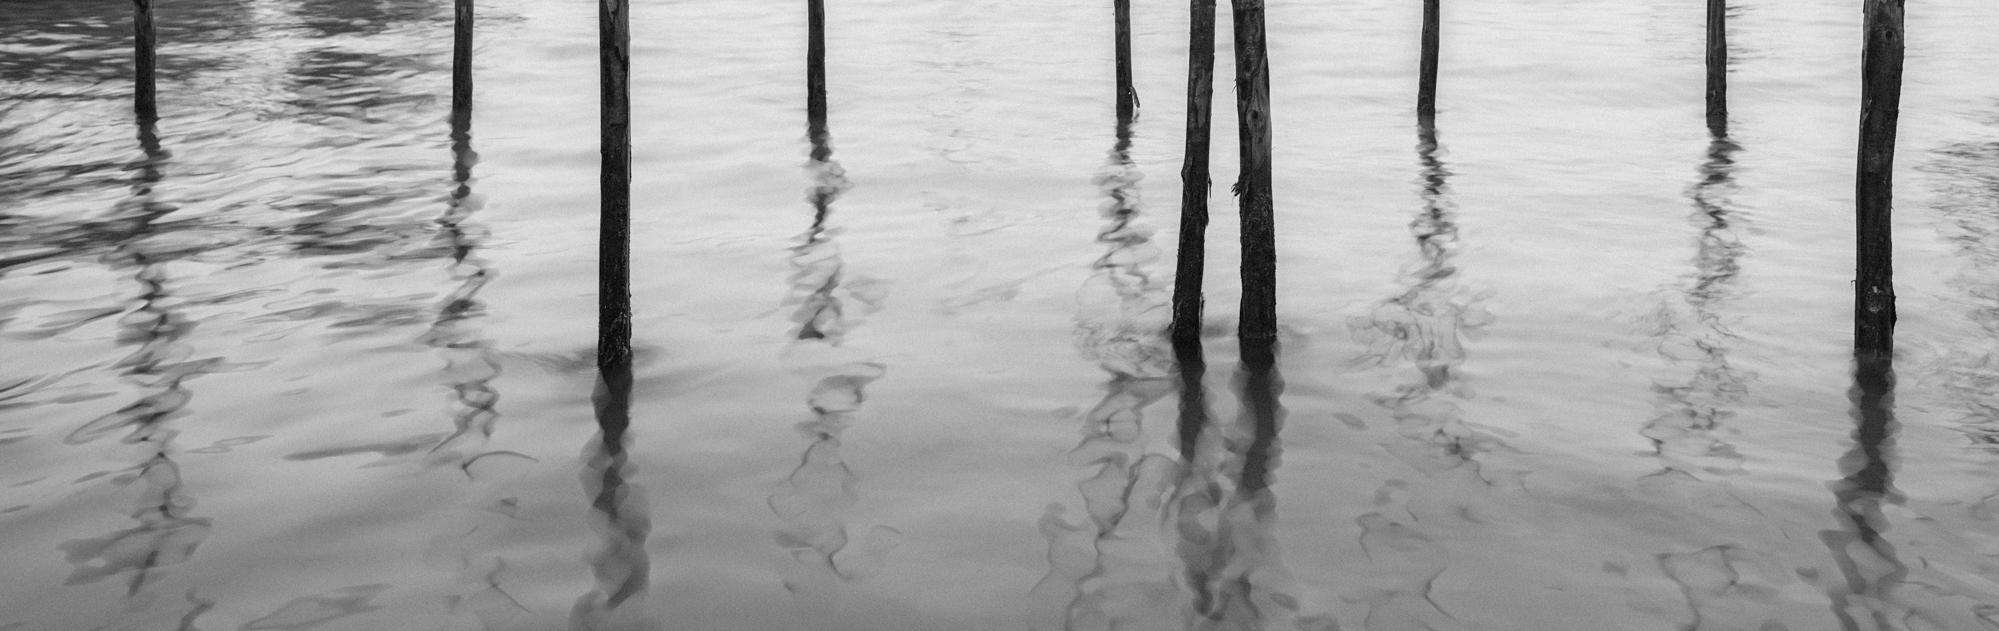 Waiting, Venice 2014